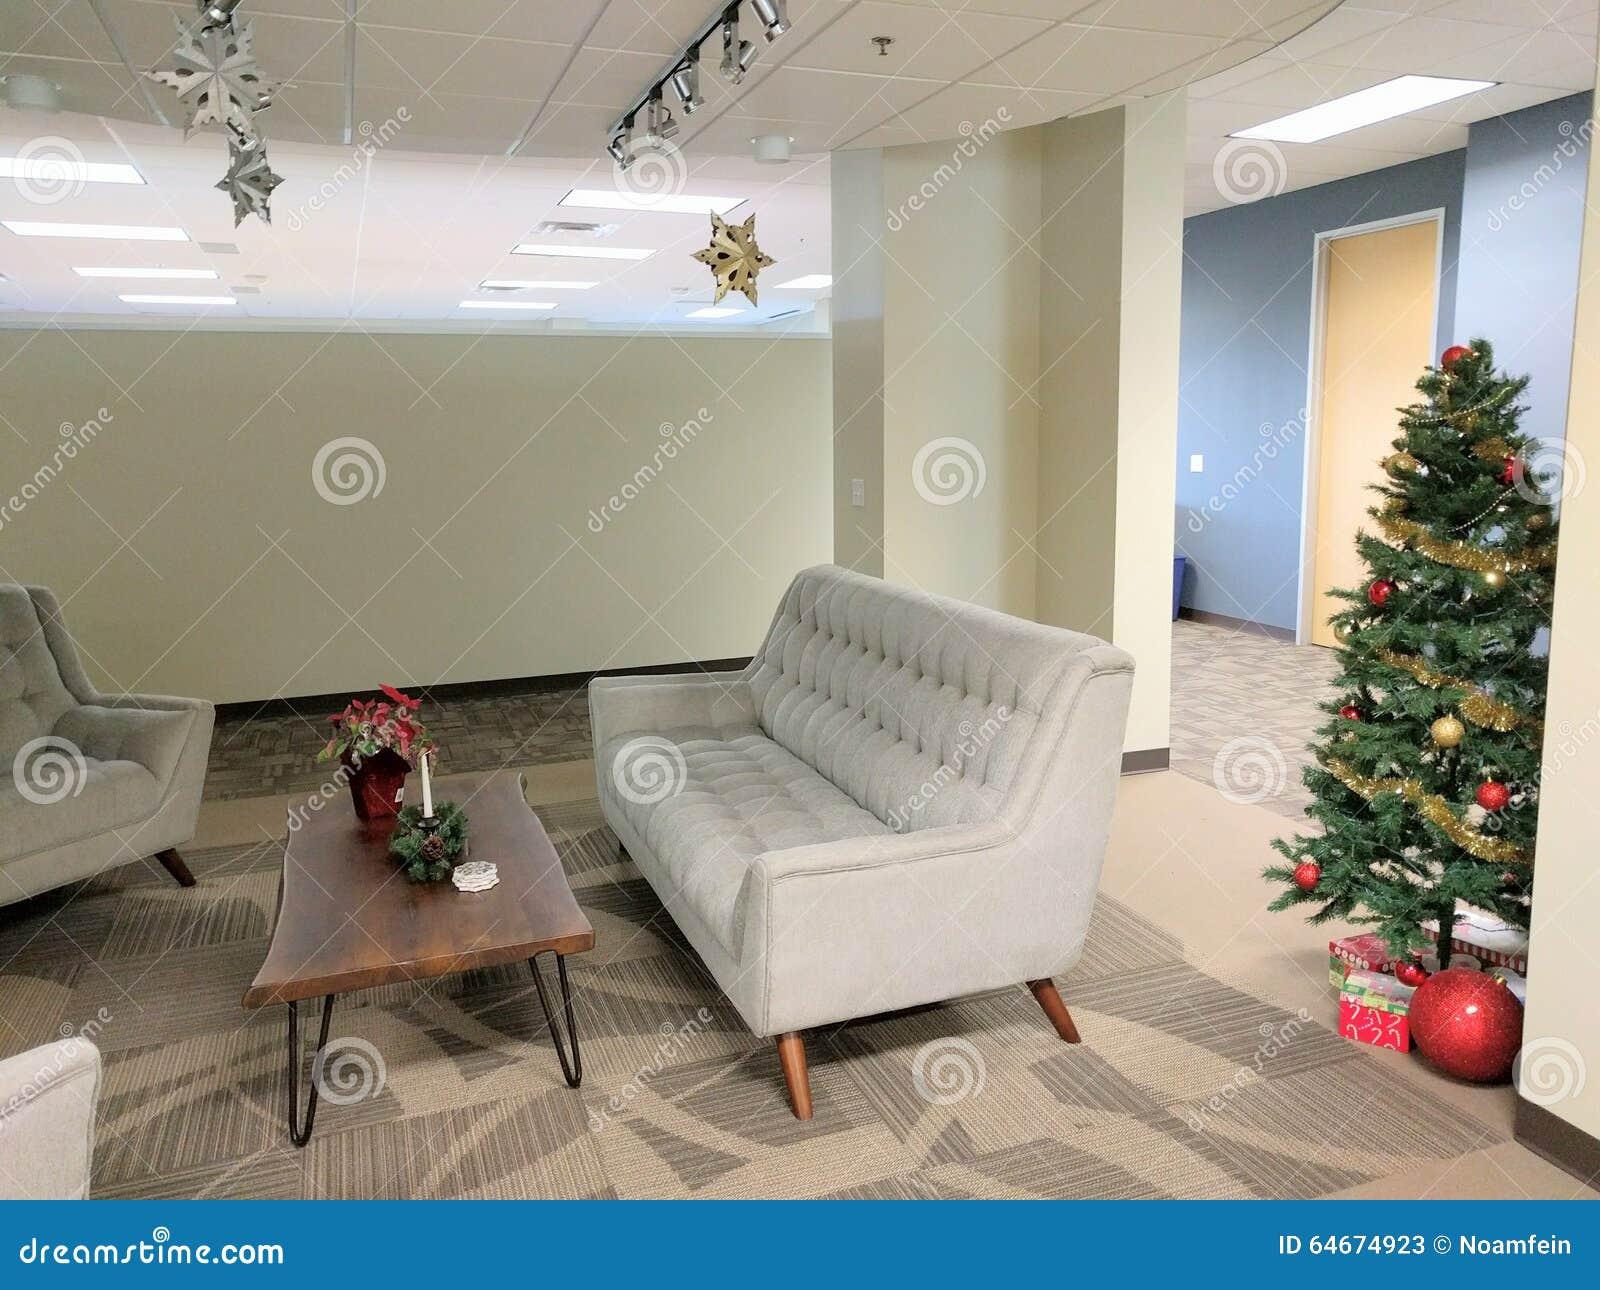 Christmas Office Decorations Stock Image - Image of season, sofa ...